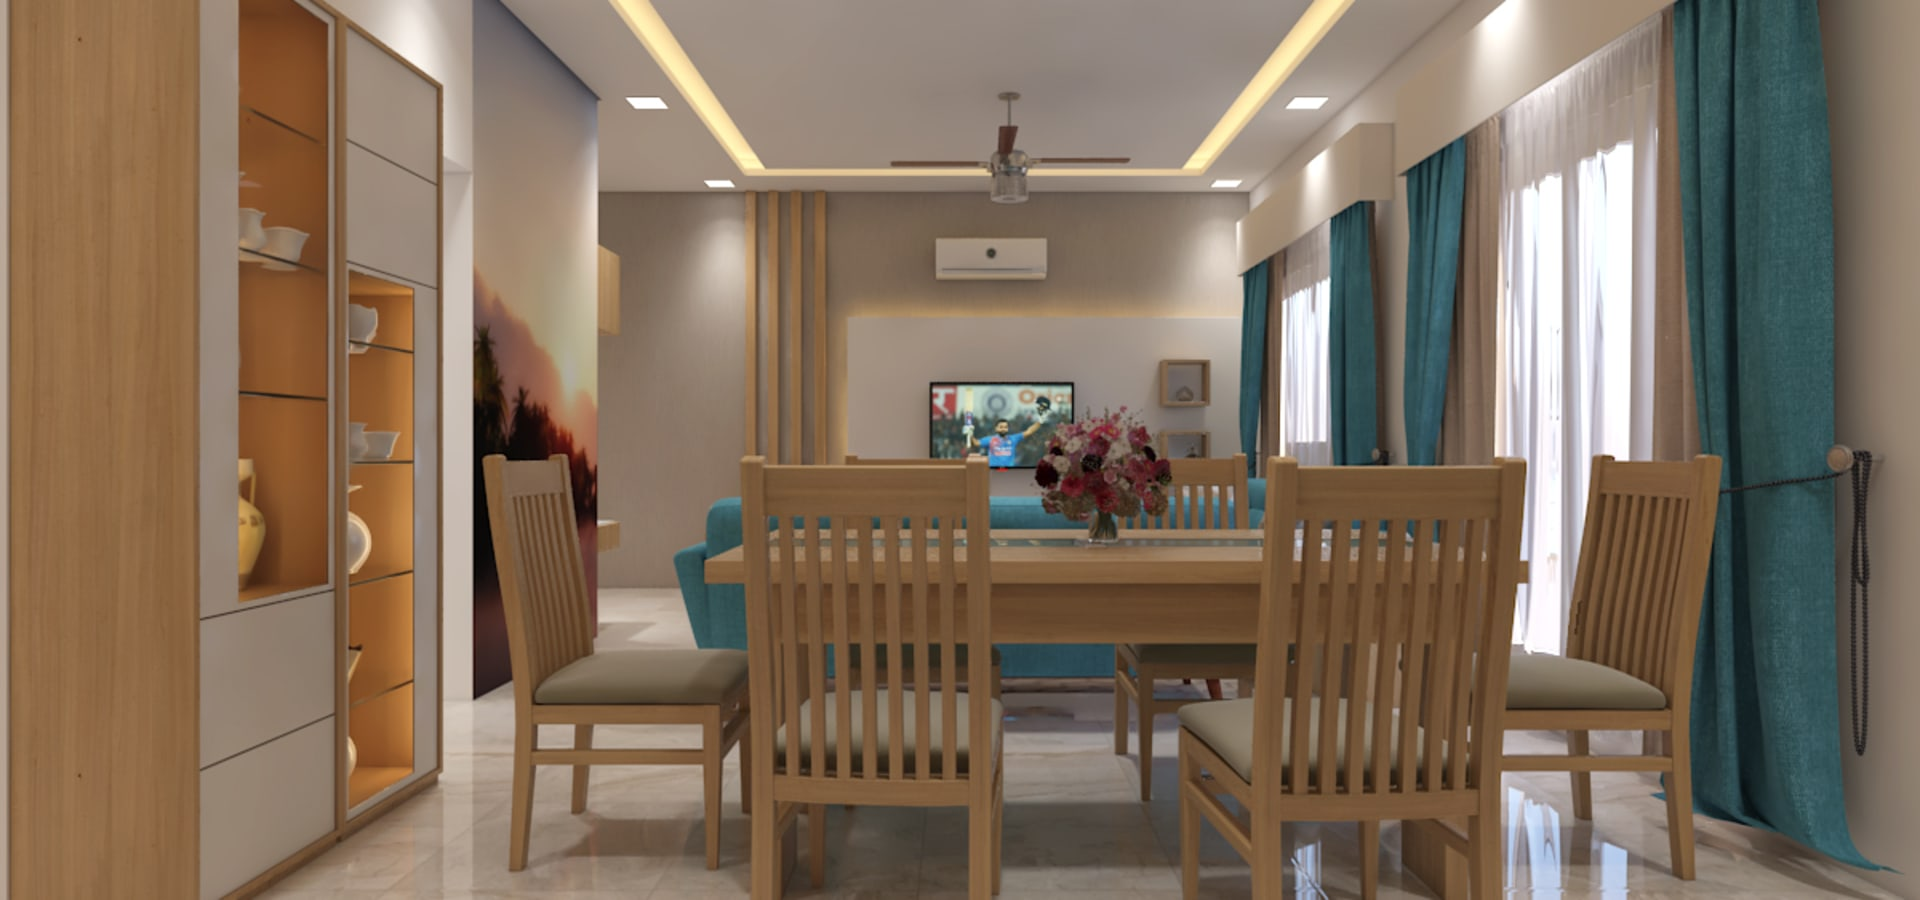 ANP Interiors Pvt Ltd